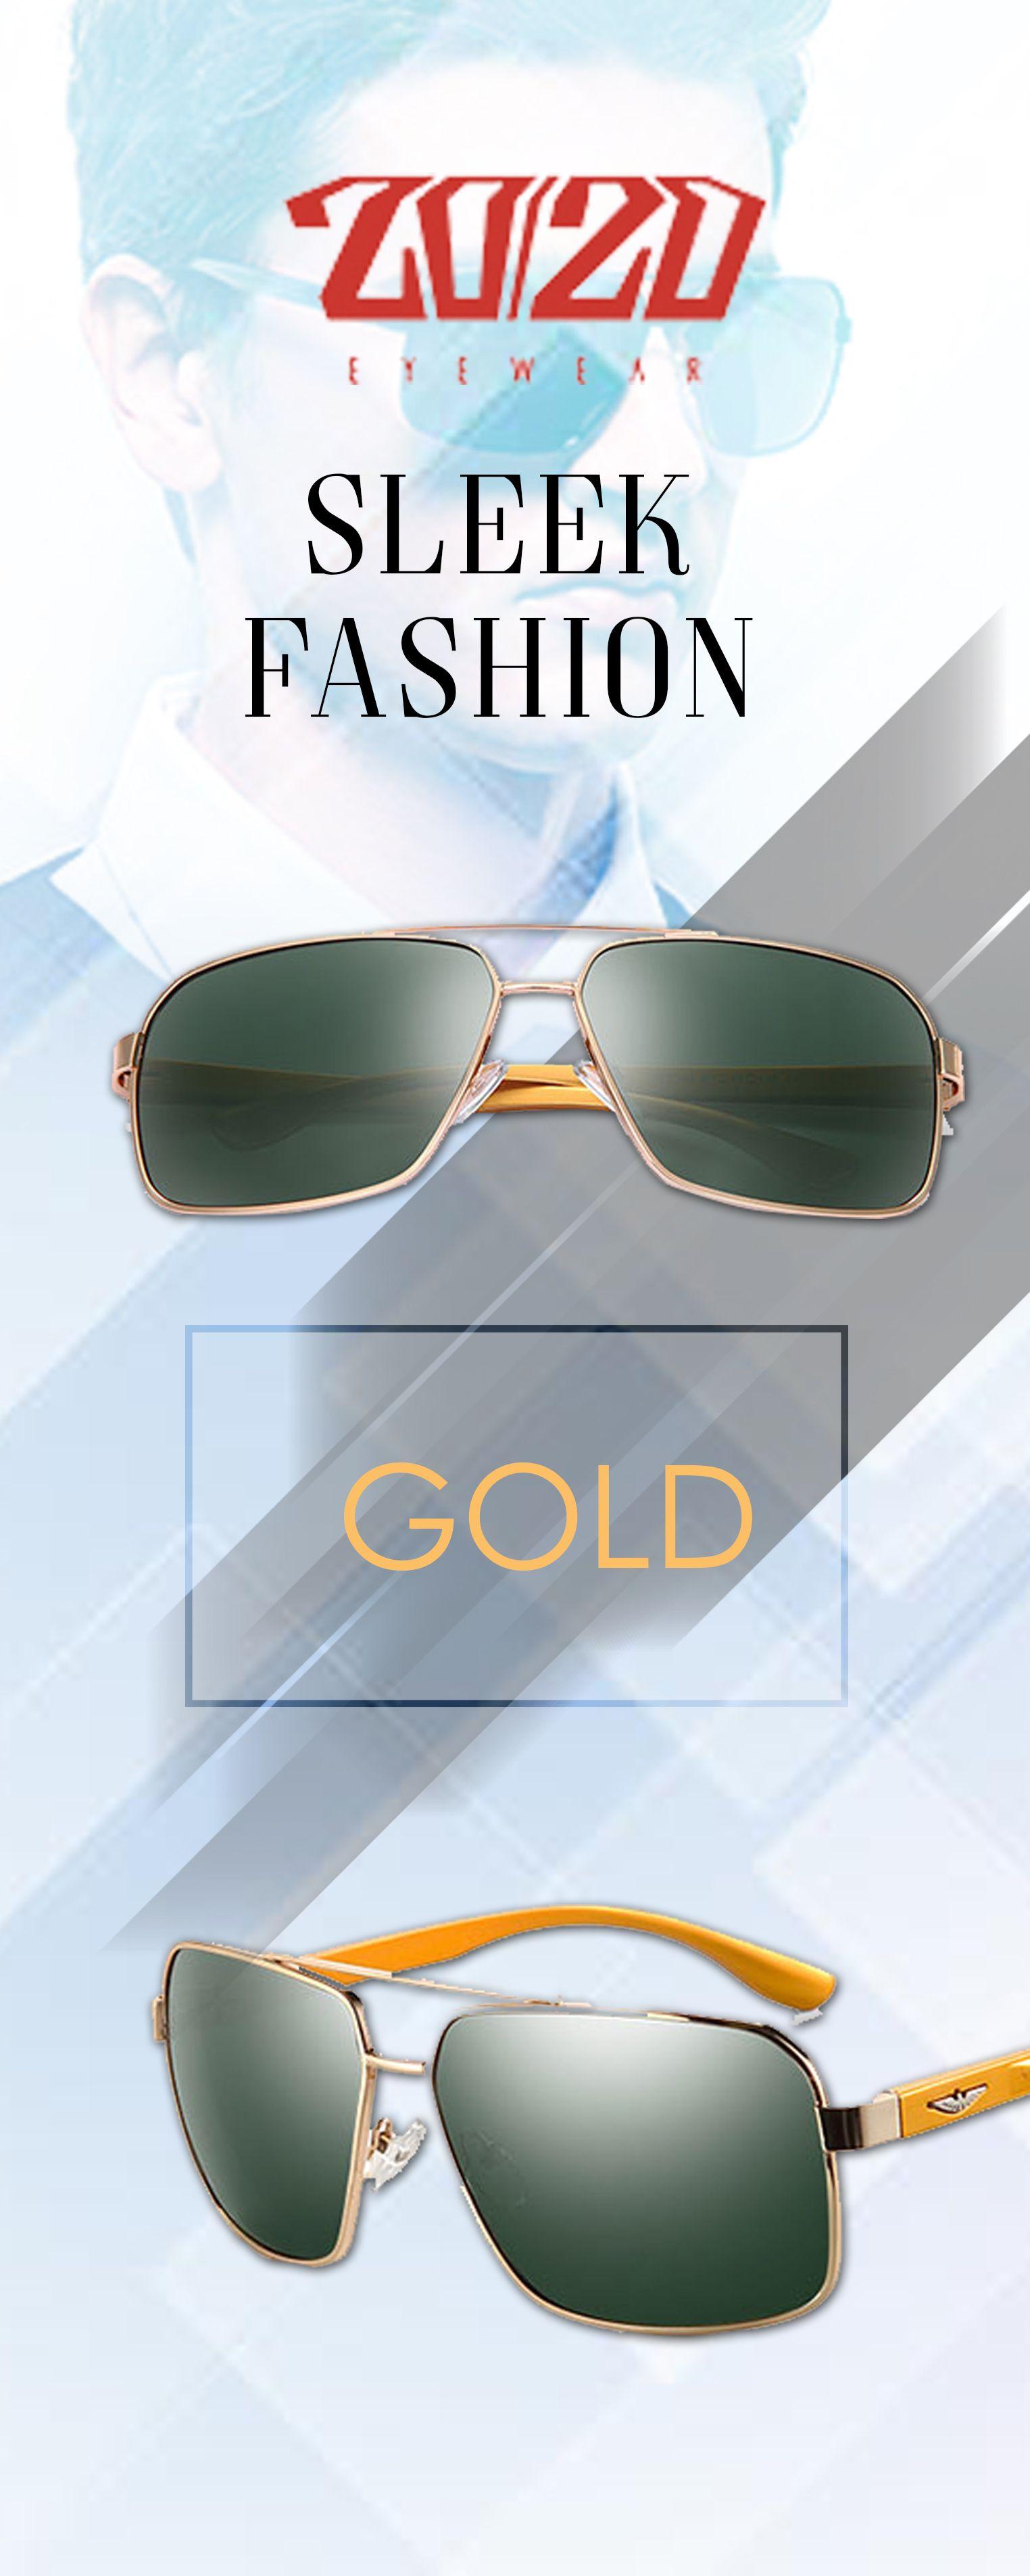 43ba44e6ed 20 20 Brand Design Aluminum Polarized Sunglasses - Gold Men s affordable  top brand designer style